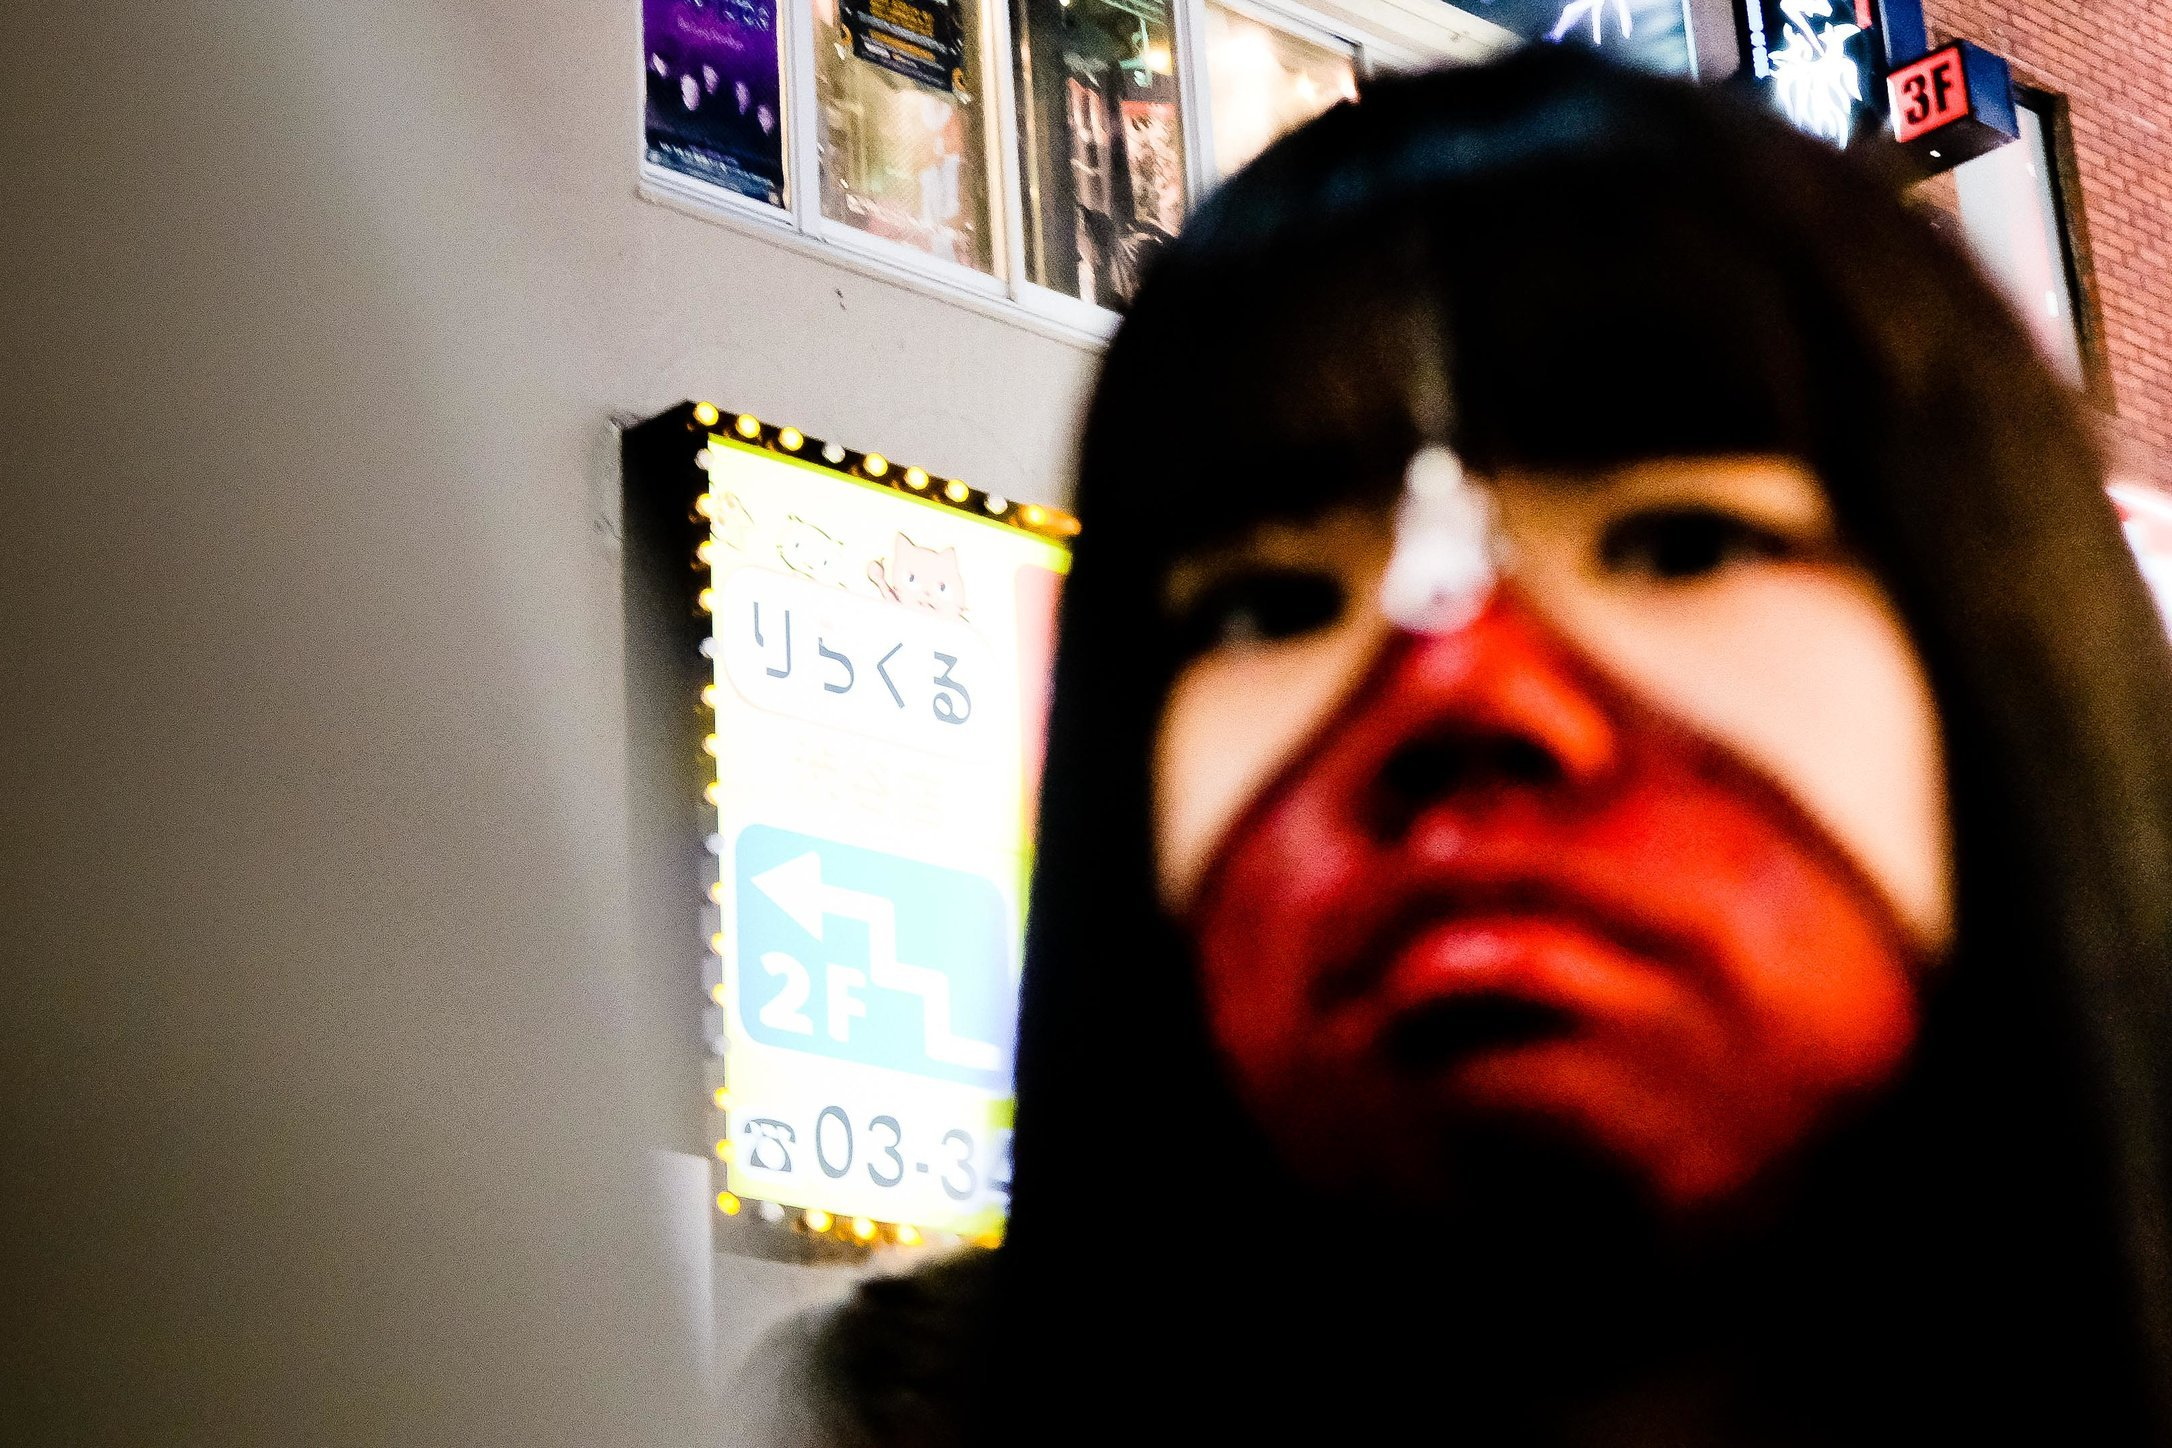 ShibuyaTimeWebsite-21.jpg